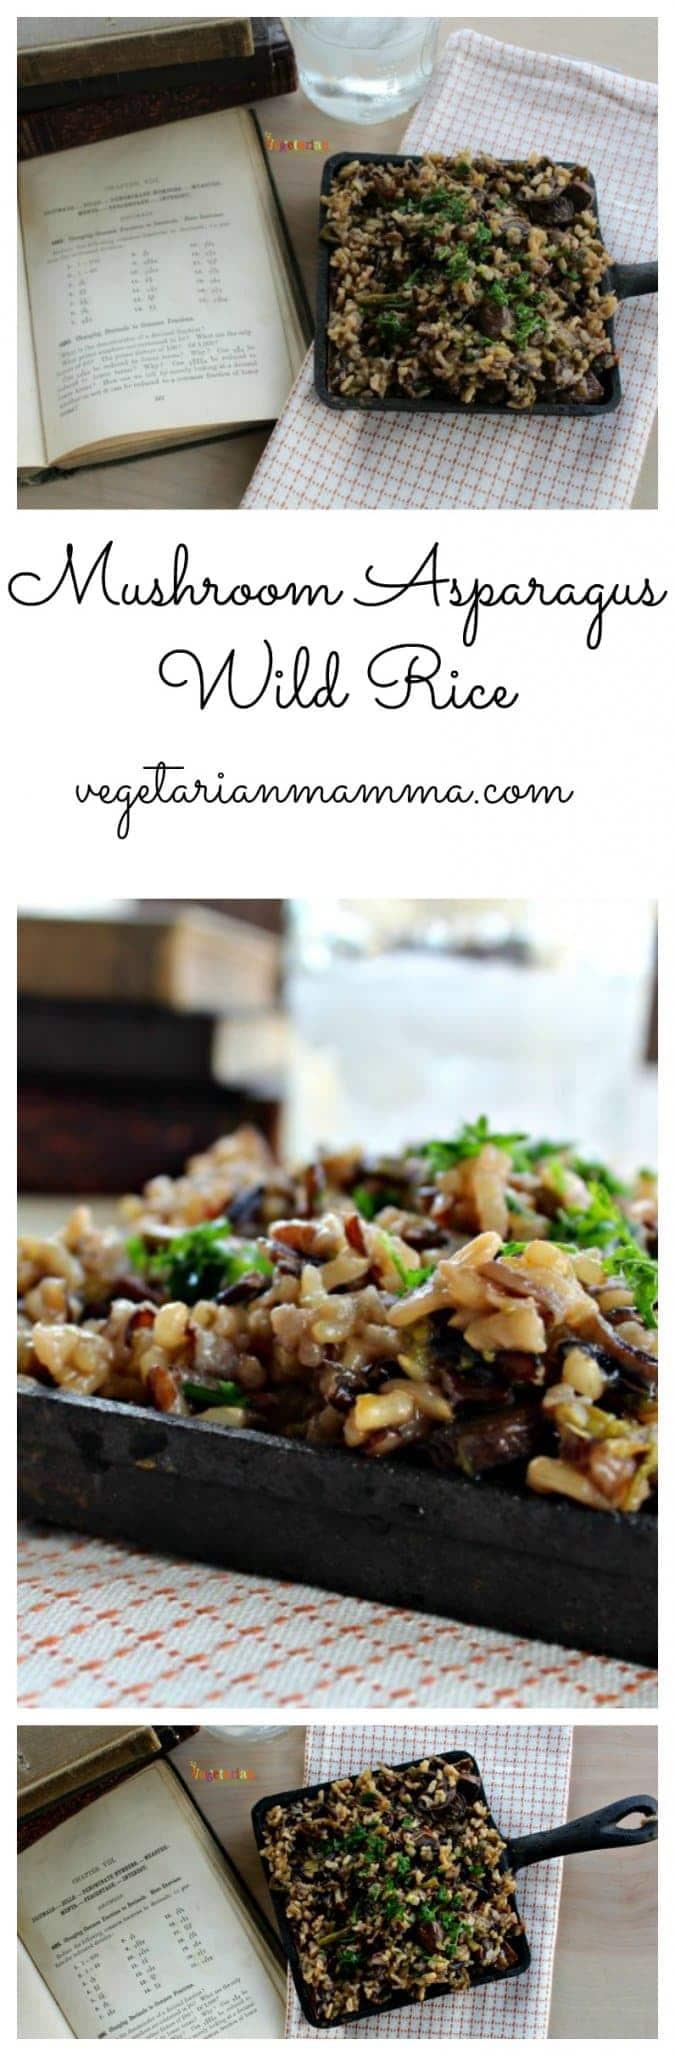 Mushroom Asparagus Wild Rice @vegetarianmamma.com #glutenfree #vegan #rice #mushroom #casserole #asparagus #vegetarian